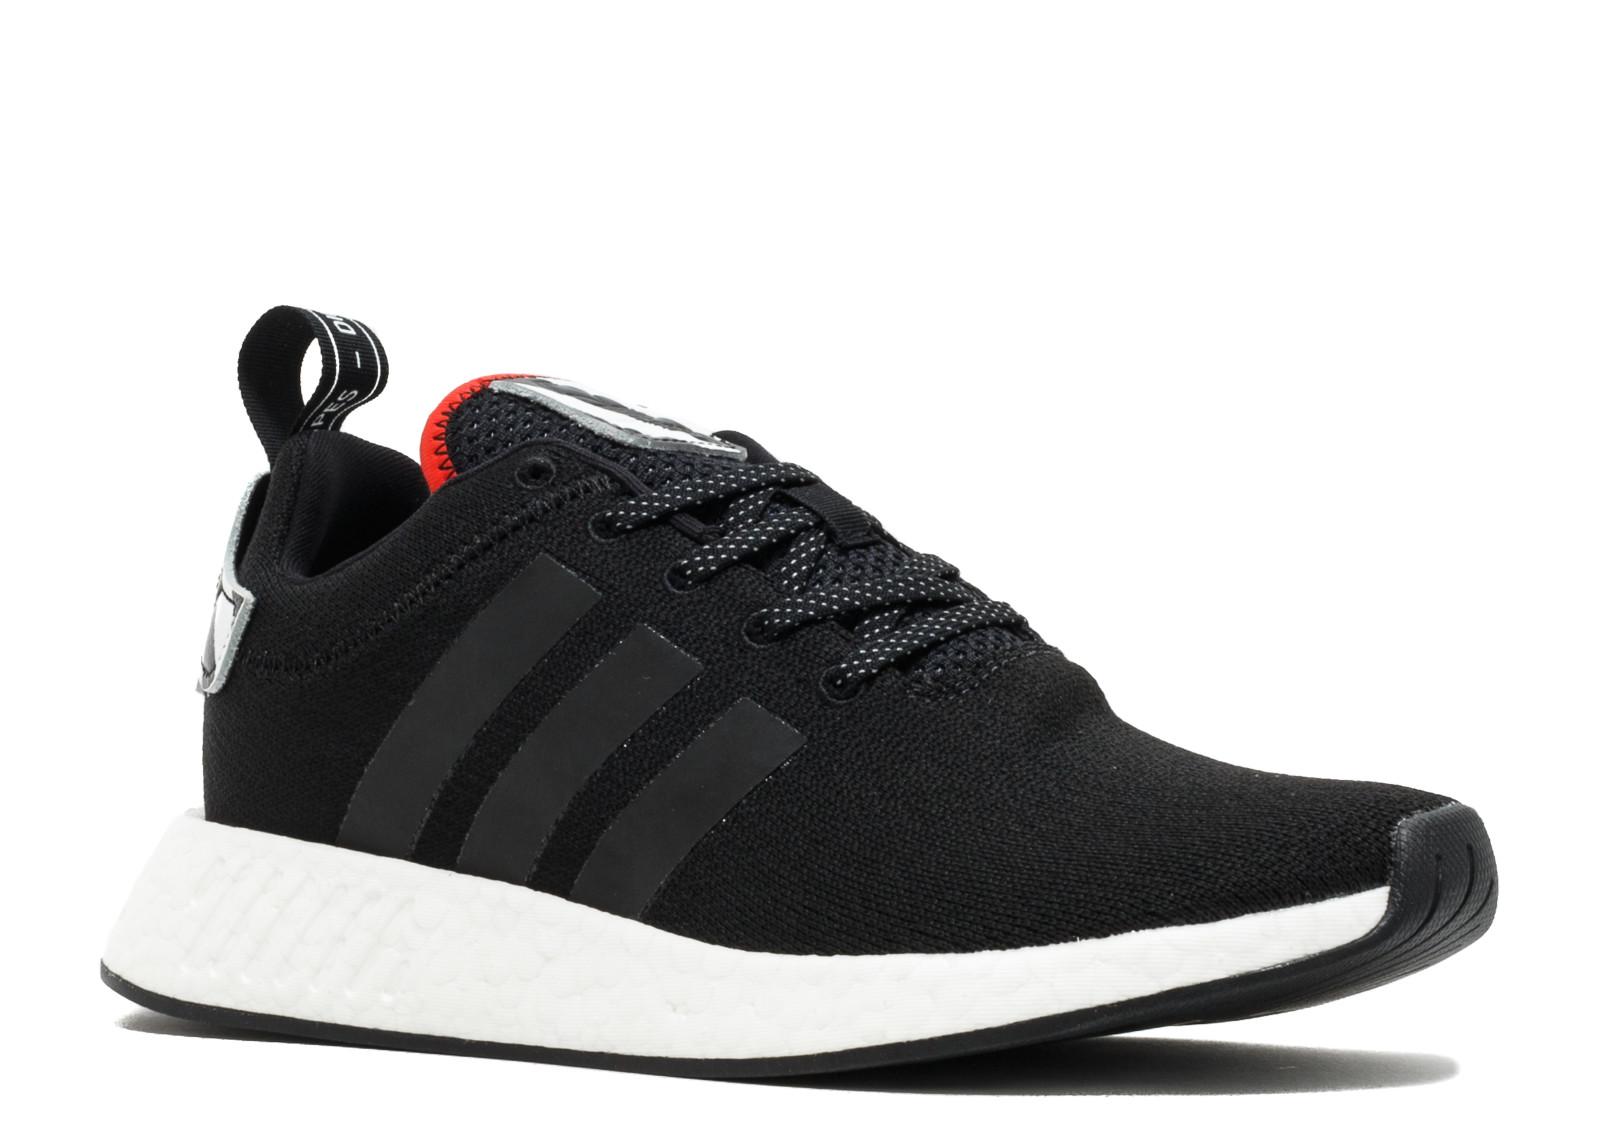 on sale 01501 540d4 Kick Avenue - Authentic Sneakers